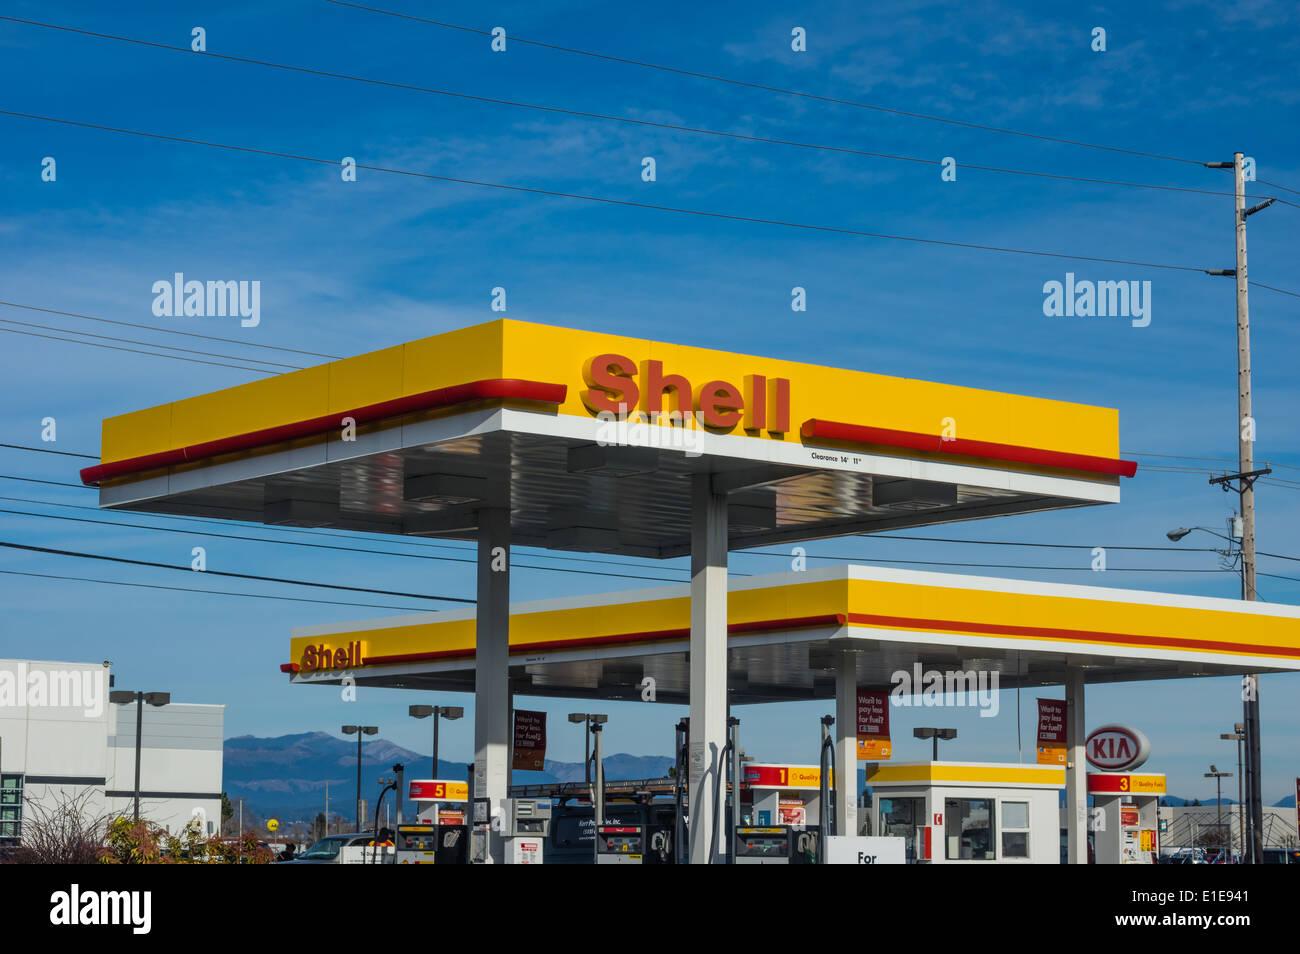 Fuel Pump Advertising Stock Photos & Fuel Pump Advertising Stock